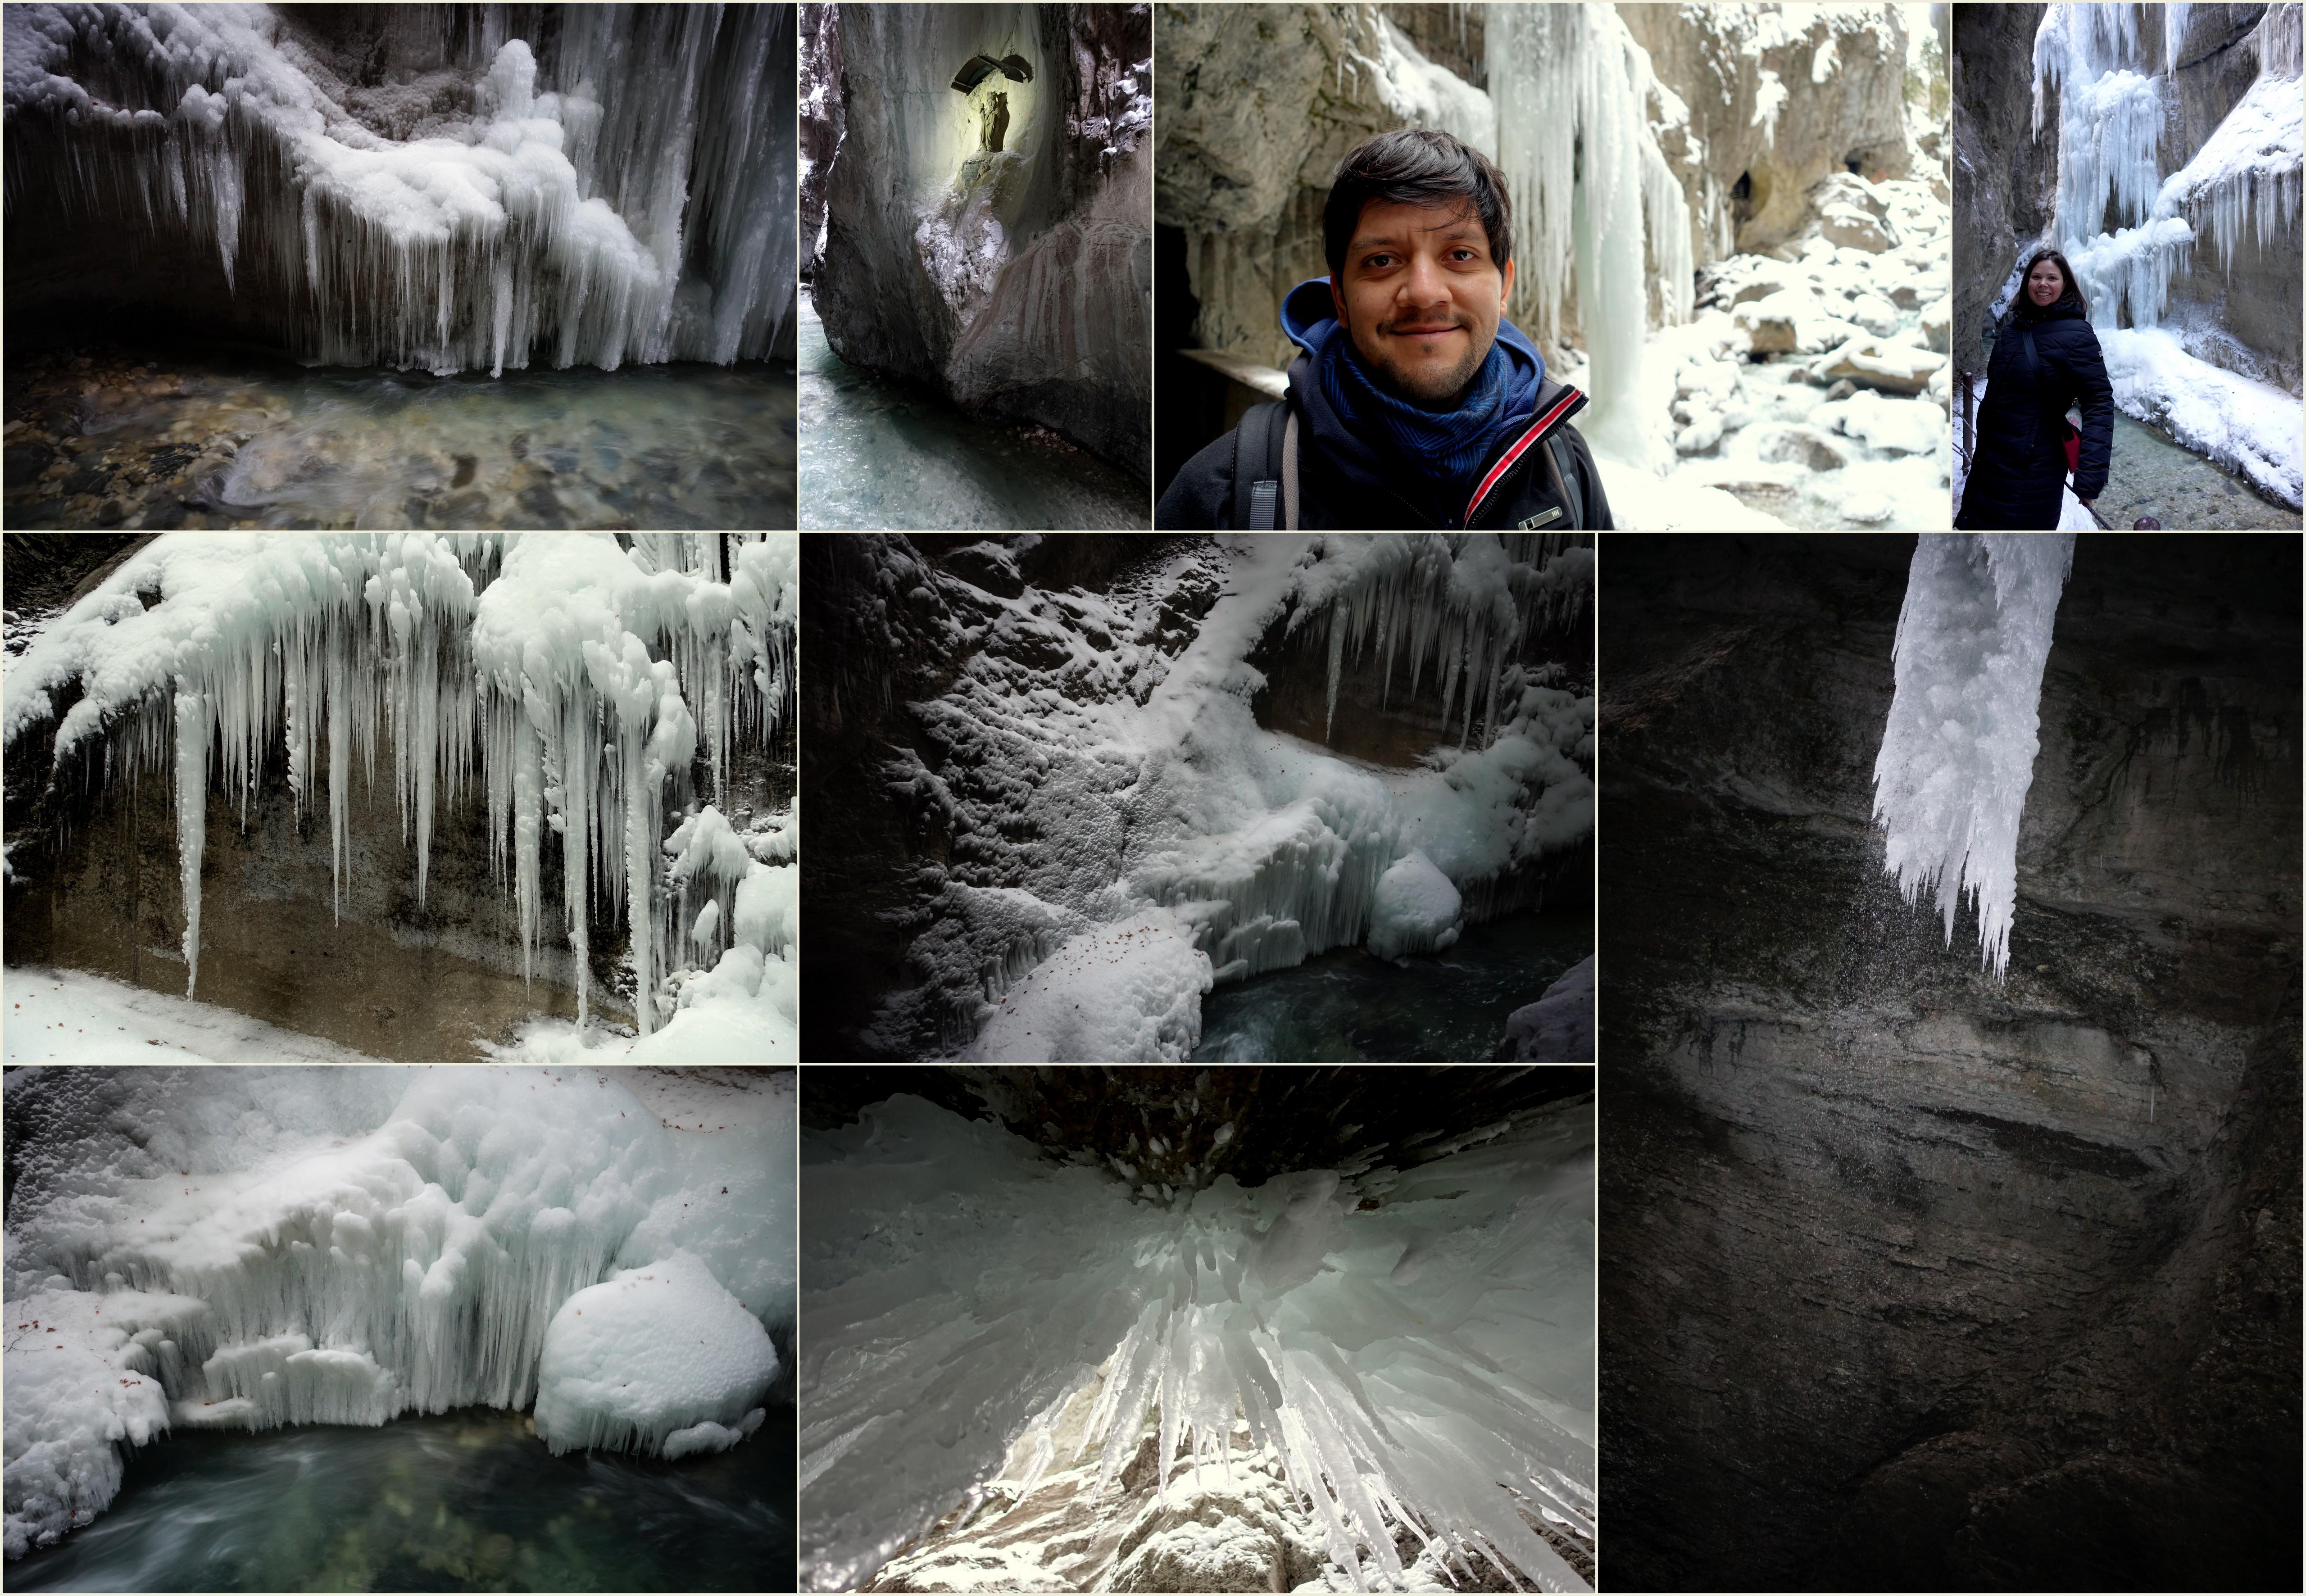 gapa_partnachklamm_winter_16.jpg